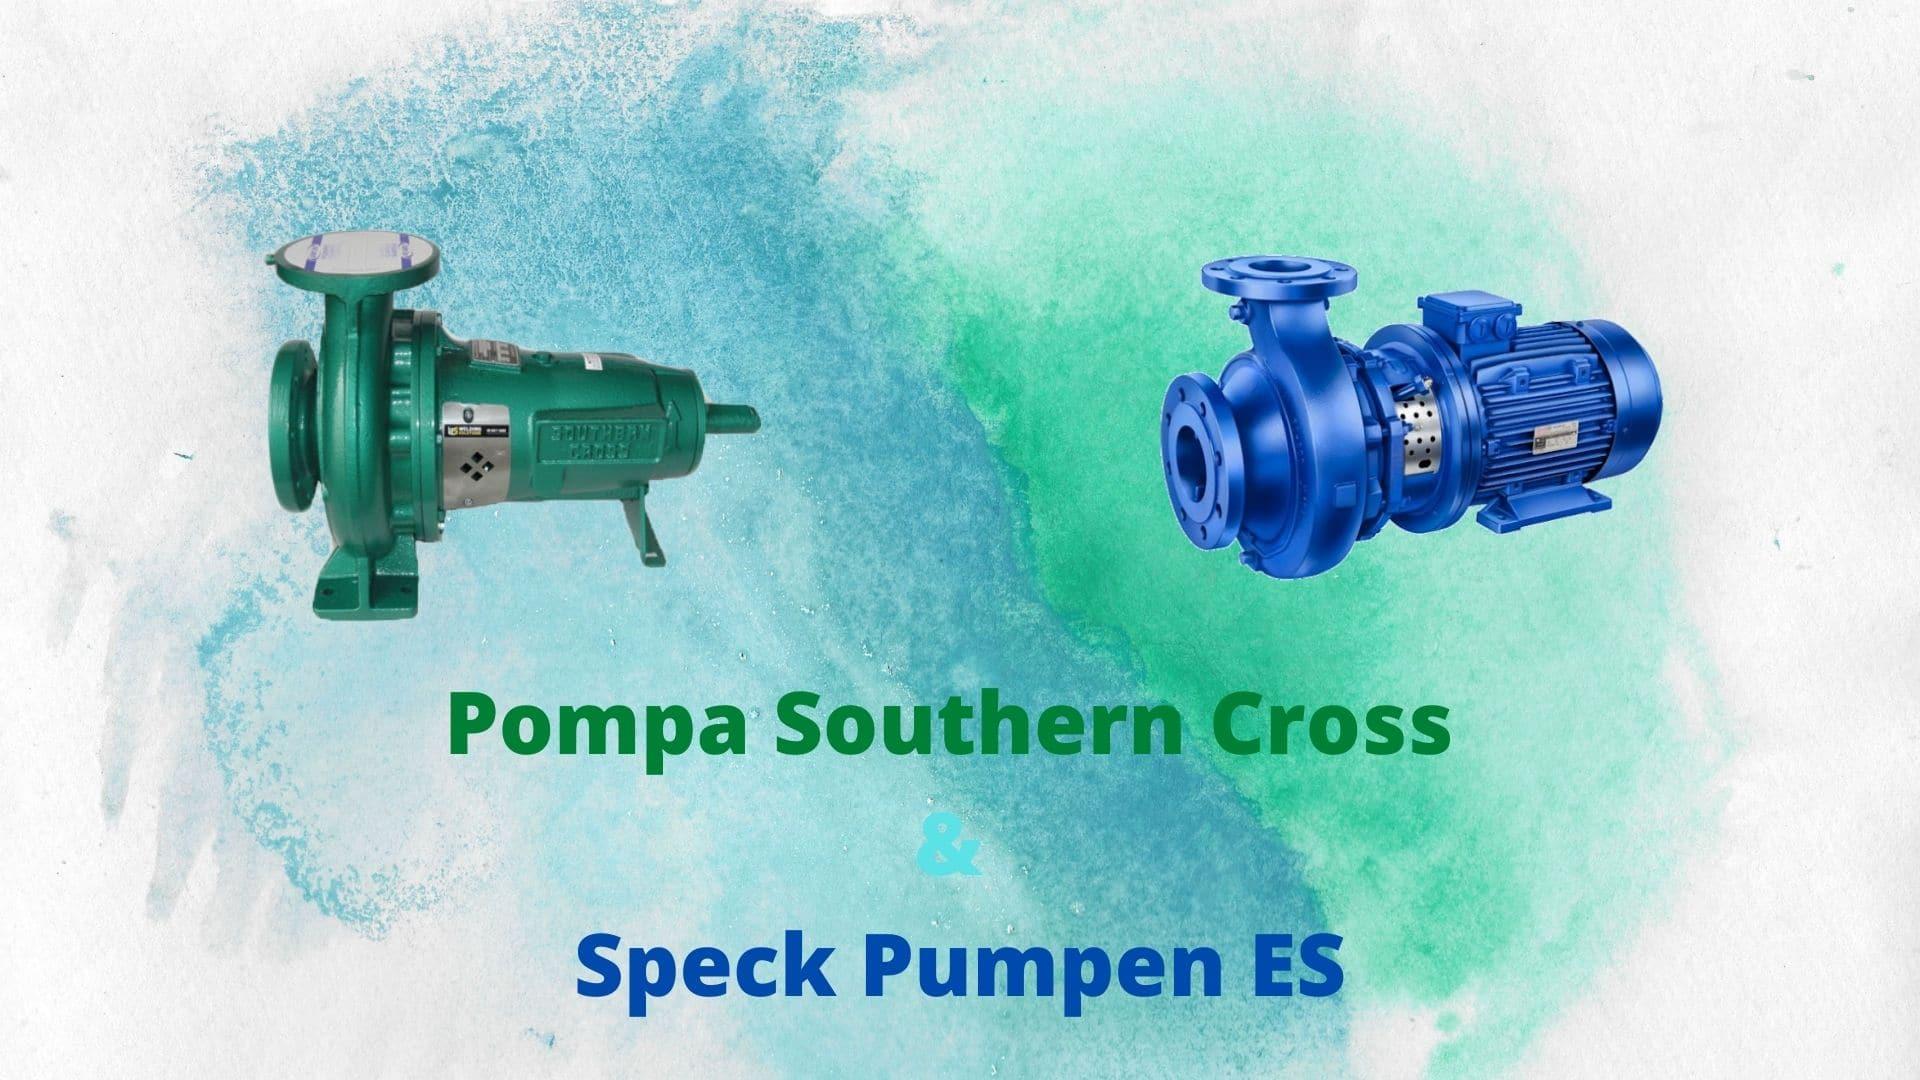 Pompa Southern Cross & Speck Pumpen ES